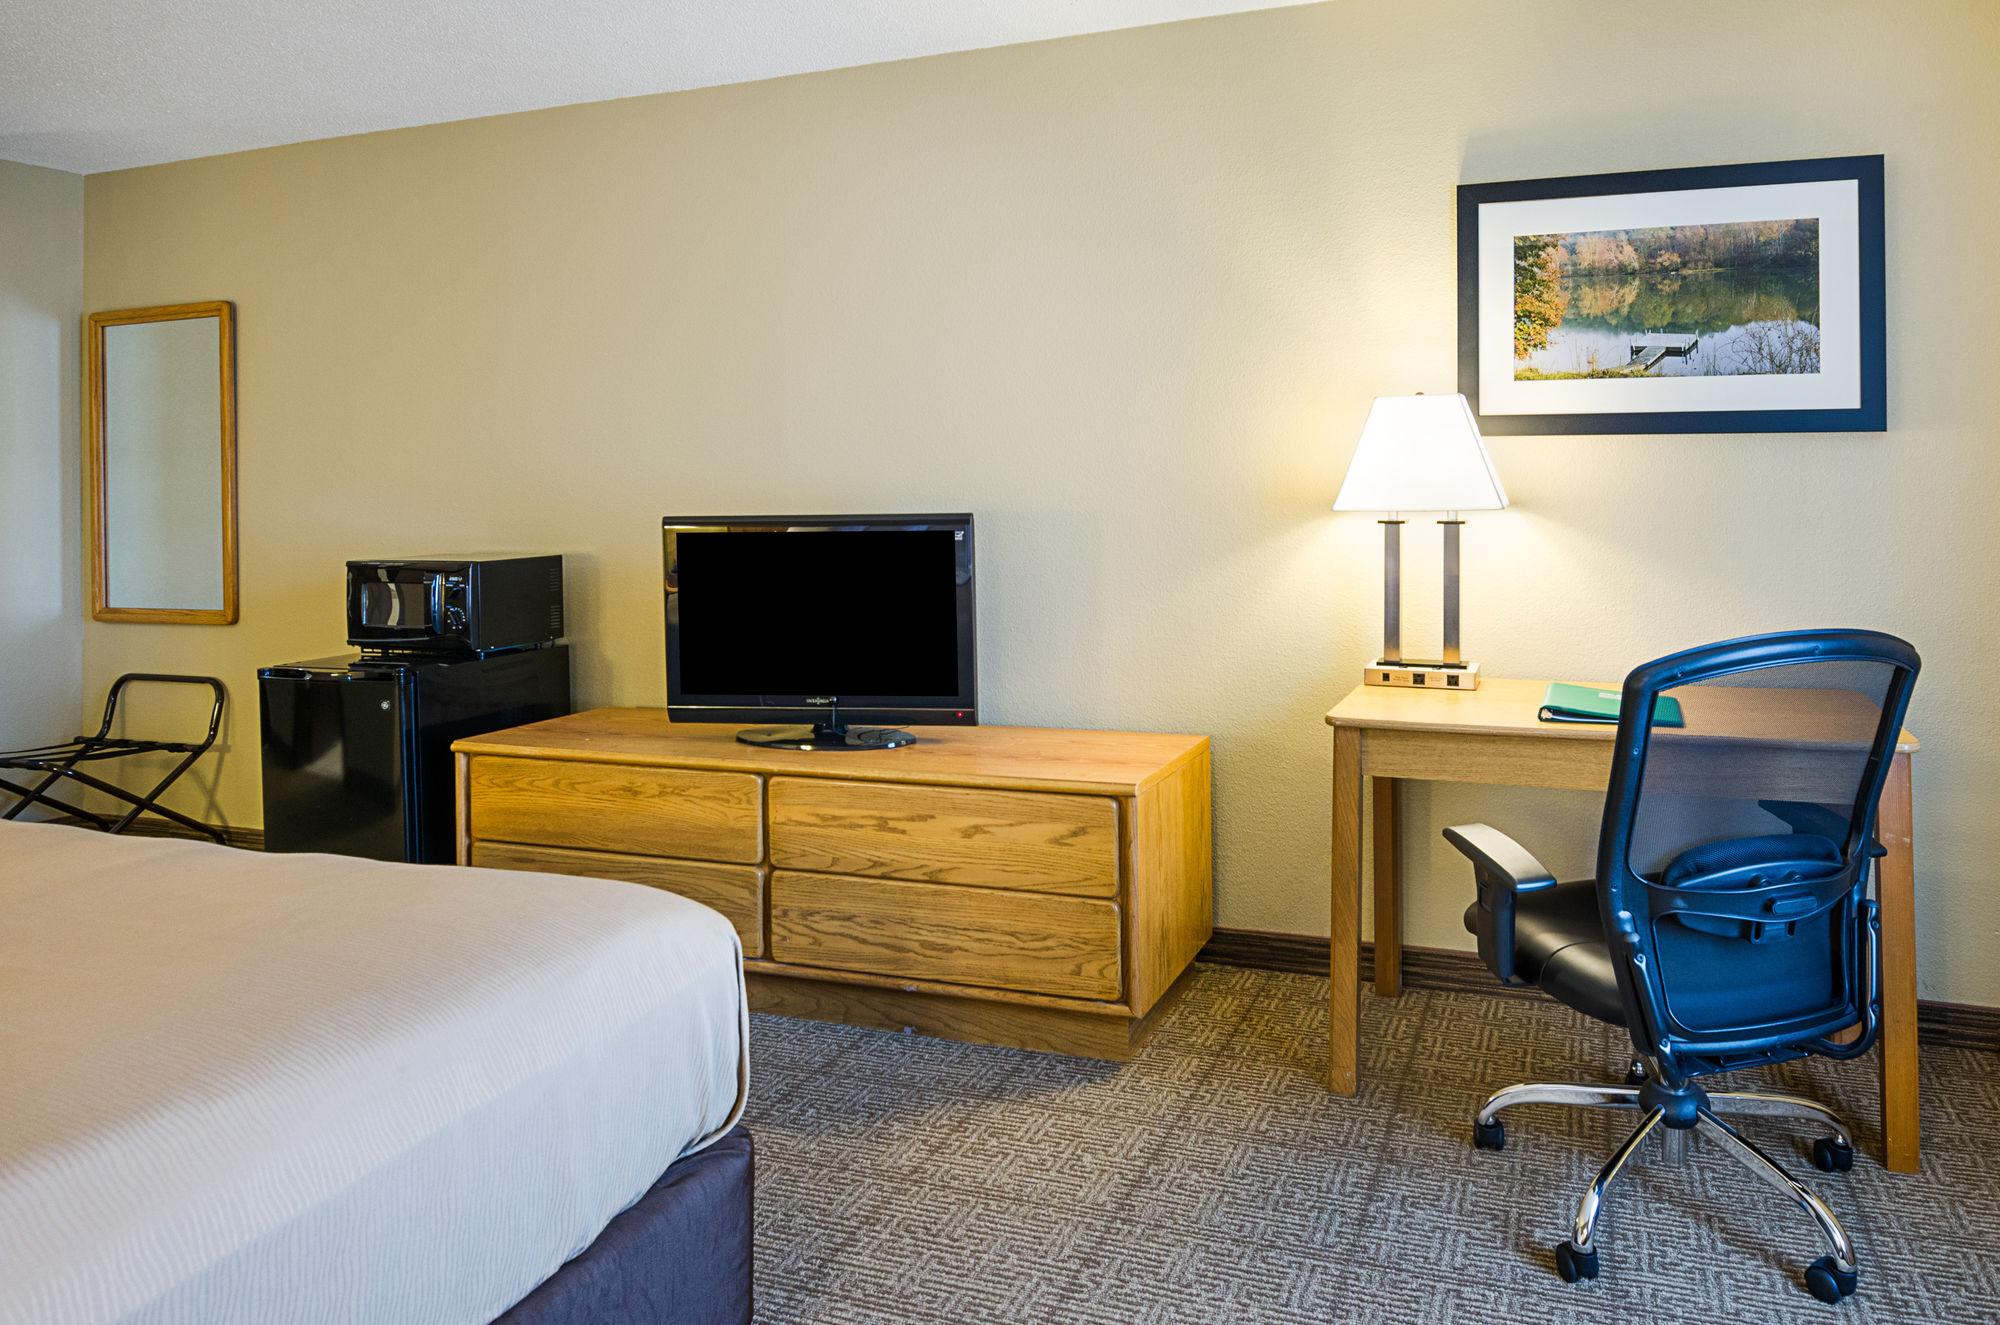 Comfort Inn in Princeton, WV